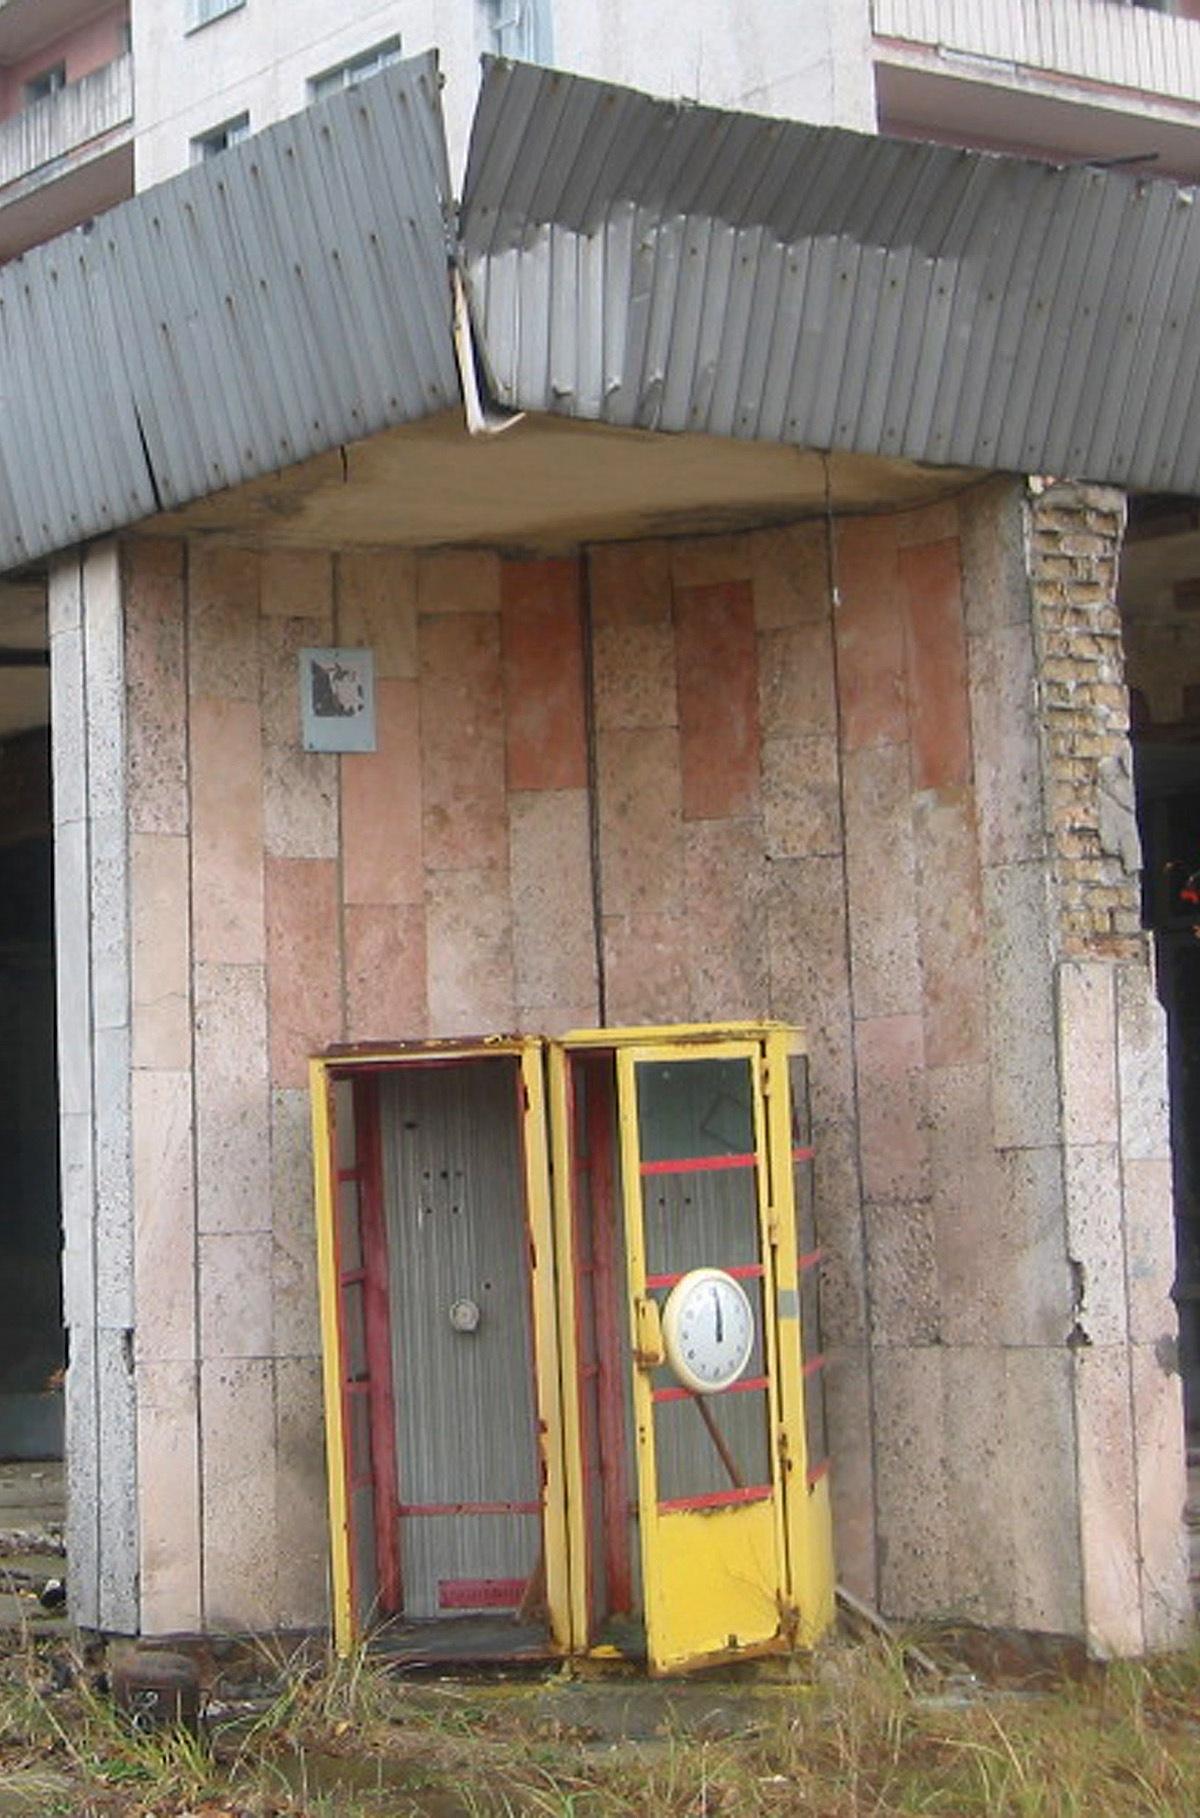 Chernobyl Pripyat Phone Booth